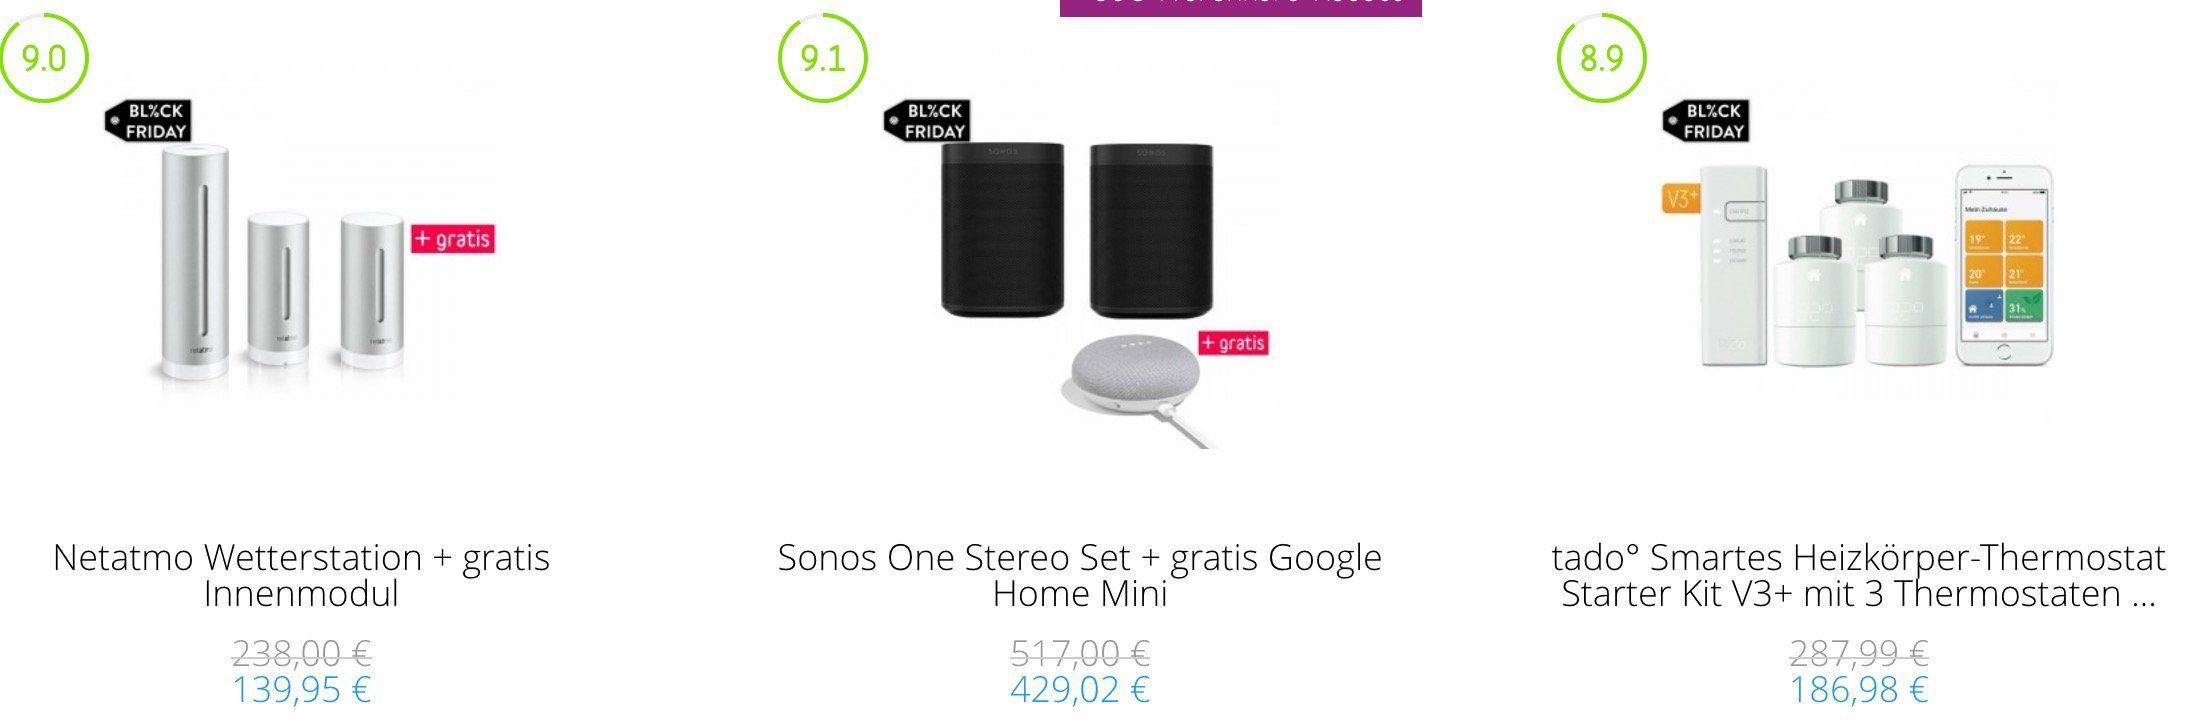 🔥 Tink Smart Home heftige Preise dank Black Freitag   z.B. tado Starter Kit V3+ mit 5 Thermostaten inkl. Google Home Mini für 299,94€ (statt 423€)